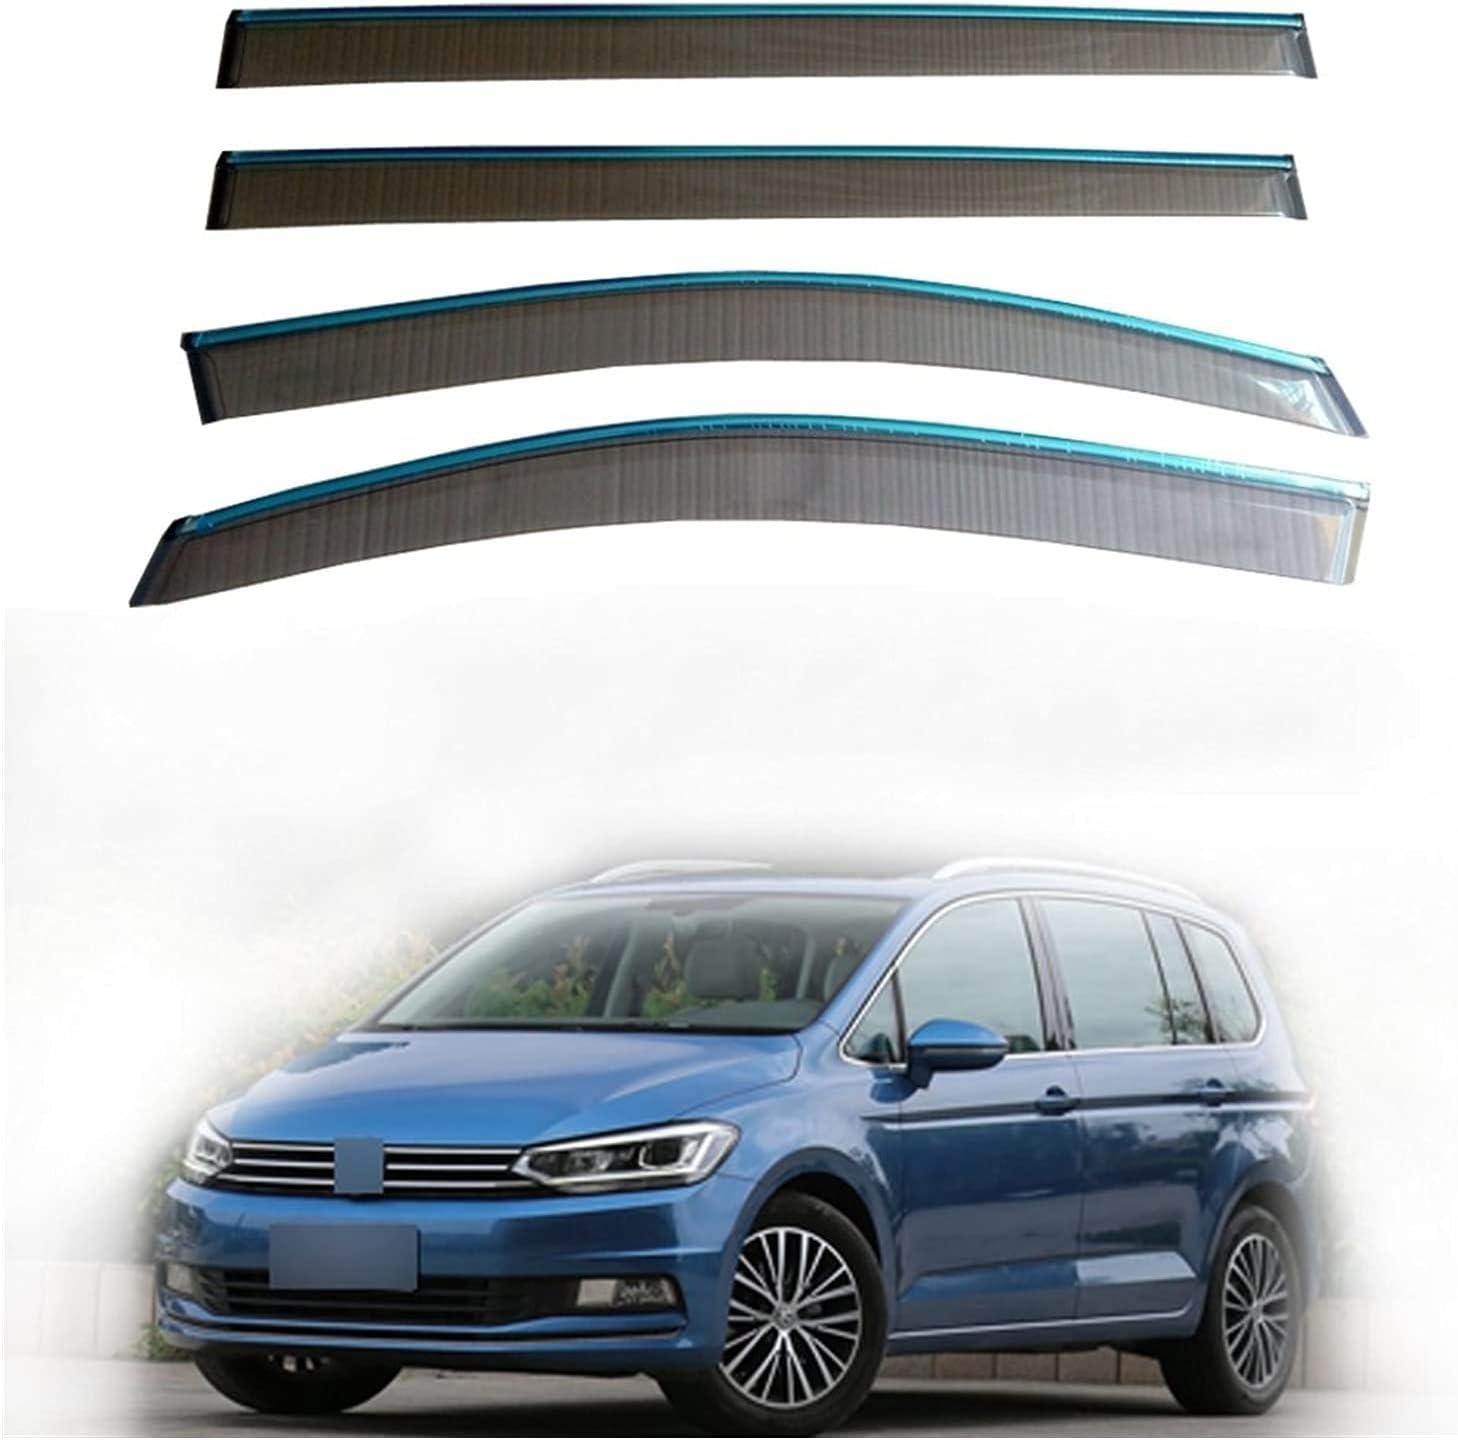 JHDS Side Window Wind Deflector Smoke Windo Car Accessories Door Max 63% Free shipping / New OFF